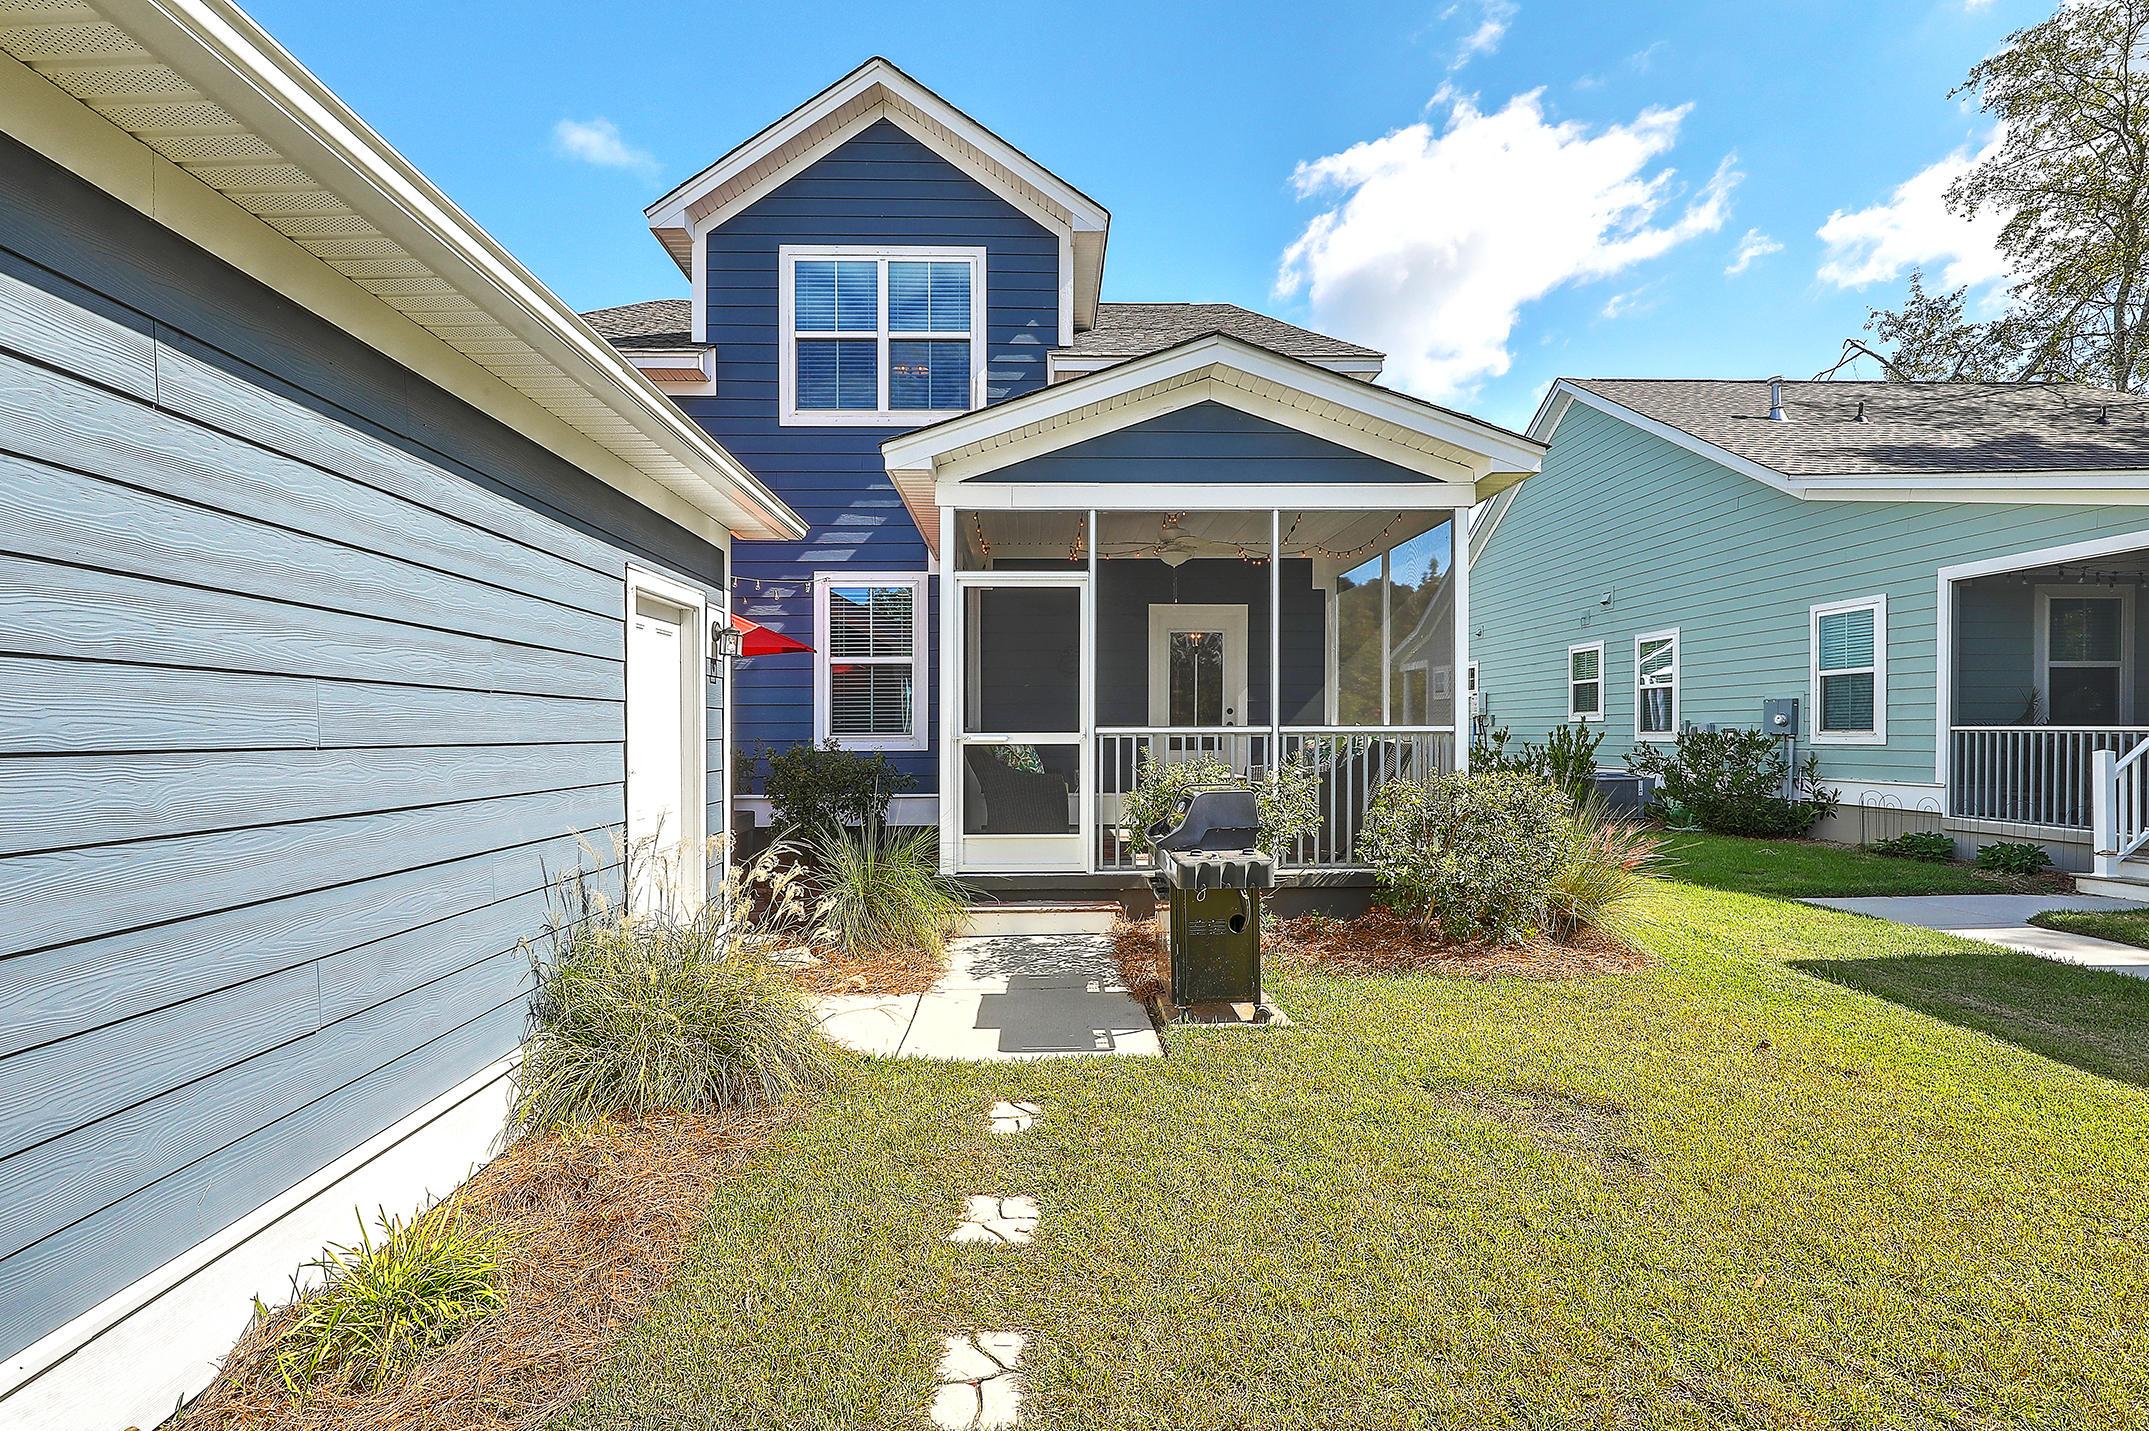 Park West Homes For Sale - 3412 Salterbeck, Mount Pleasant, SC - 27